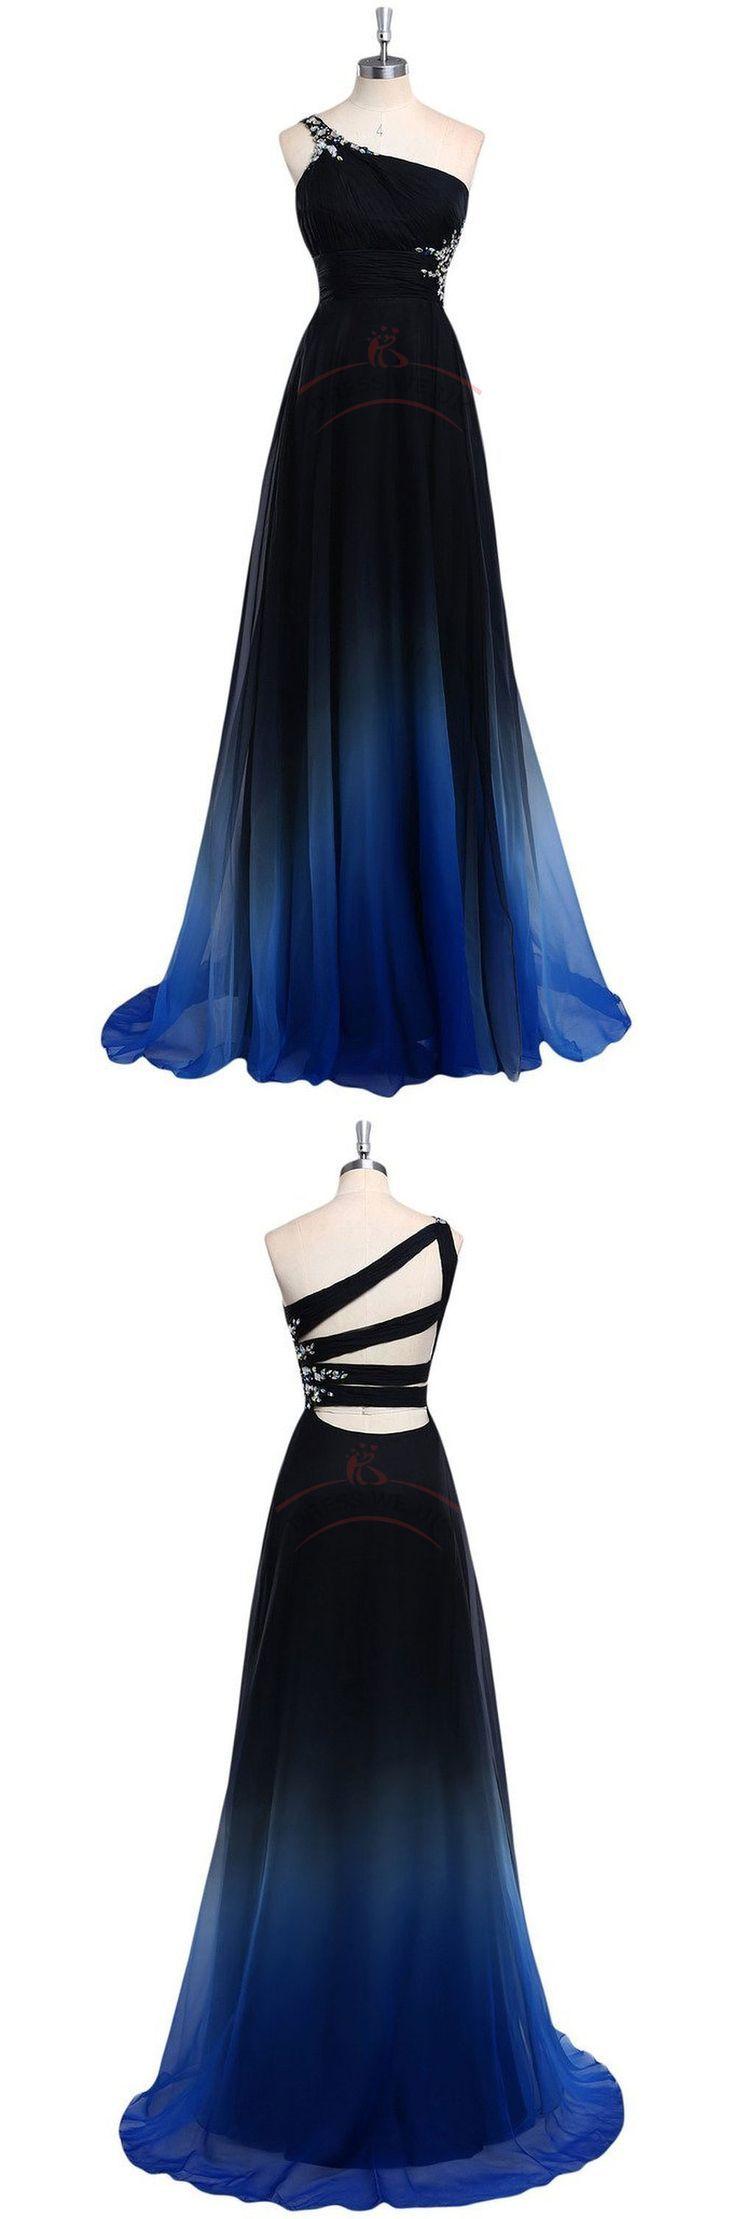 1481 best Dresses images on Pinterest | Retro fashion, Sweet dress ...